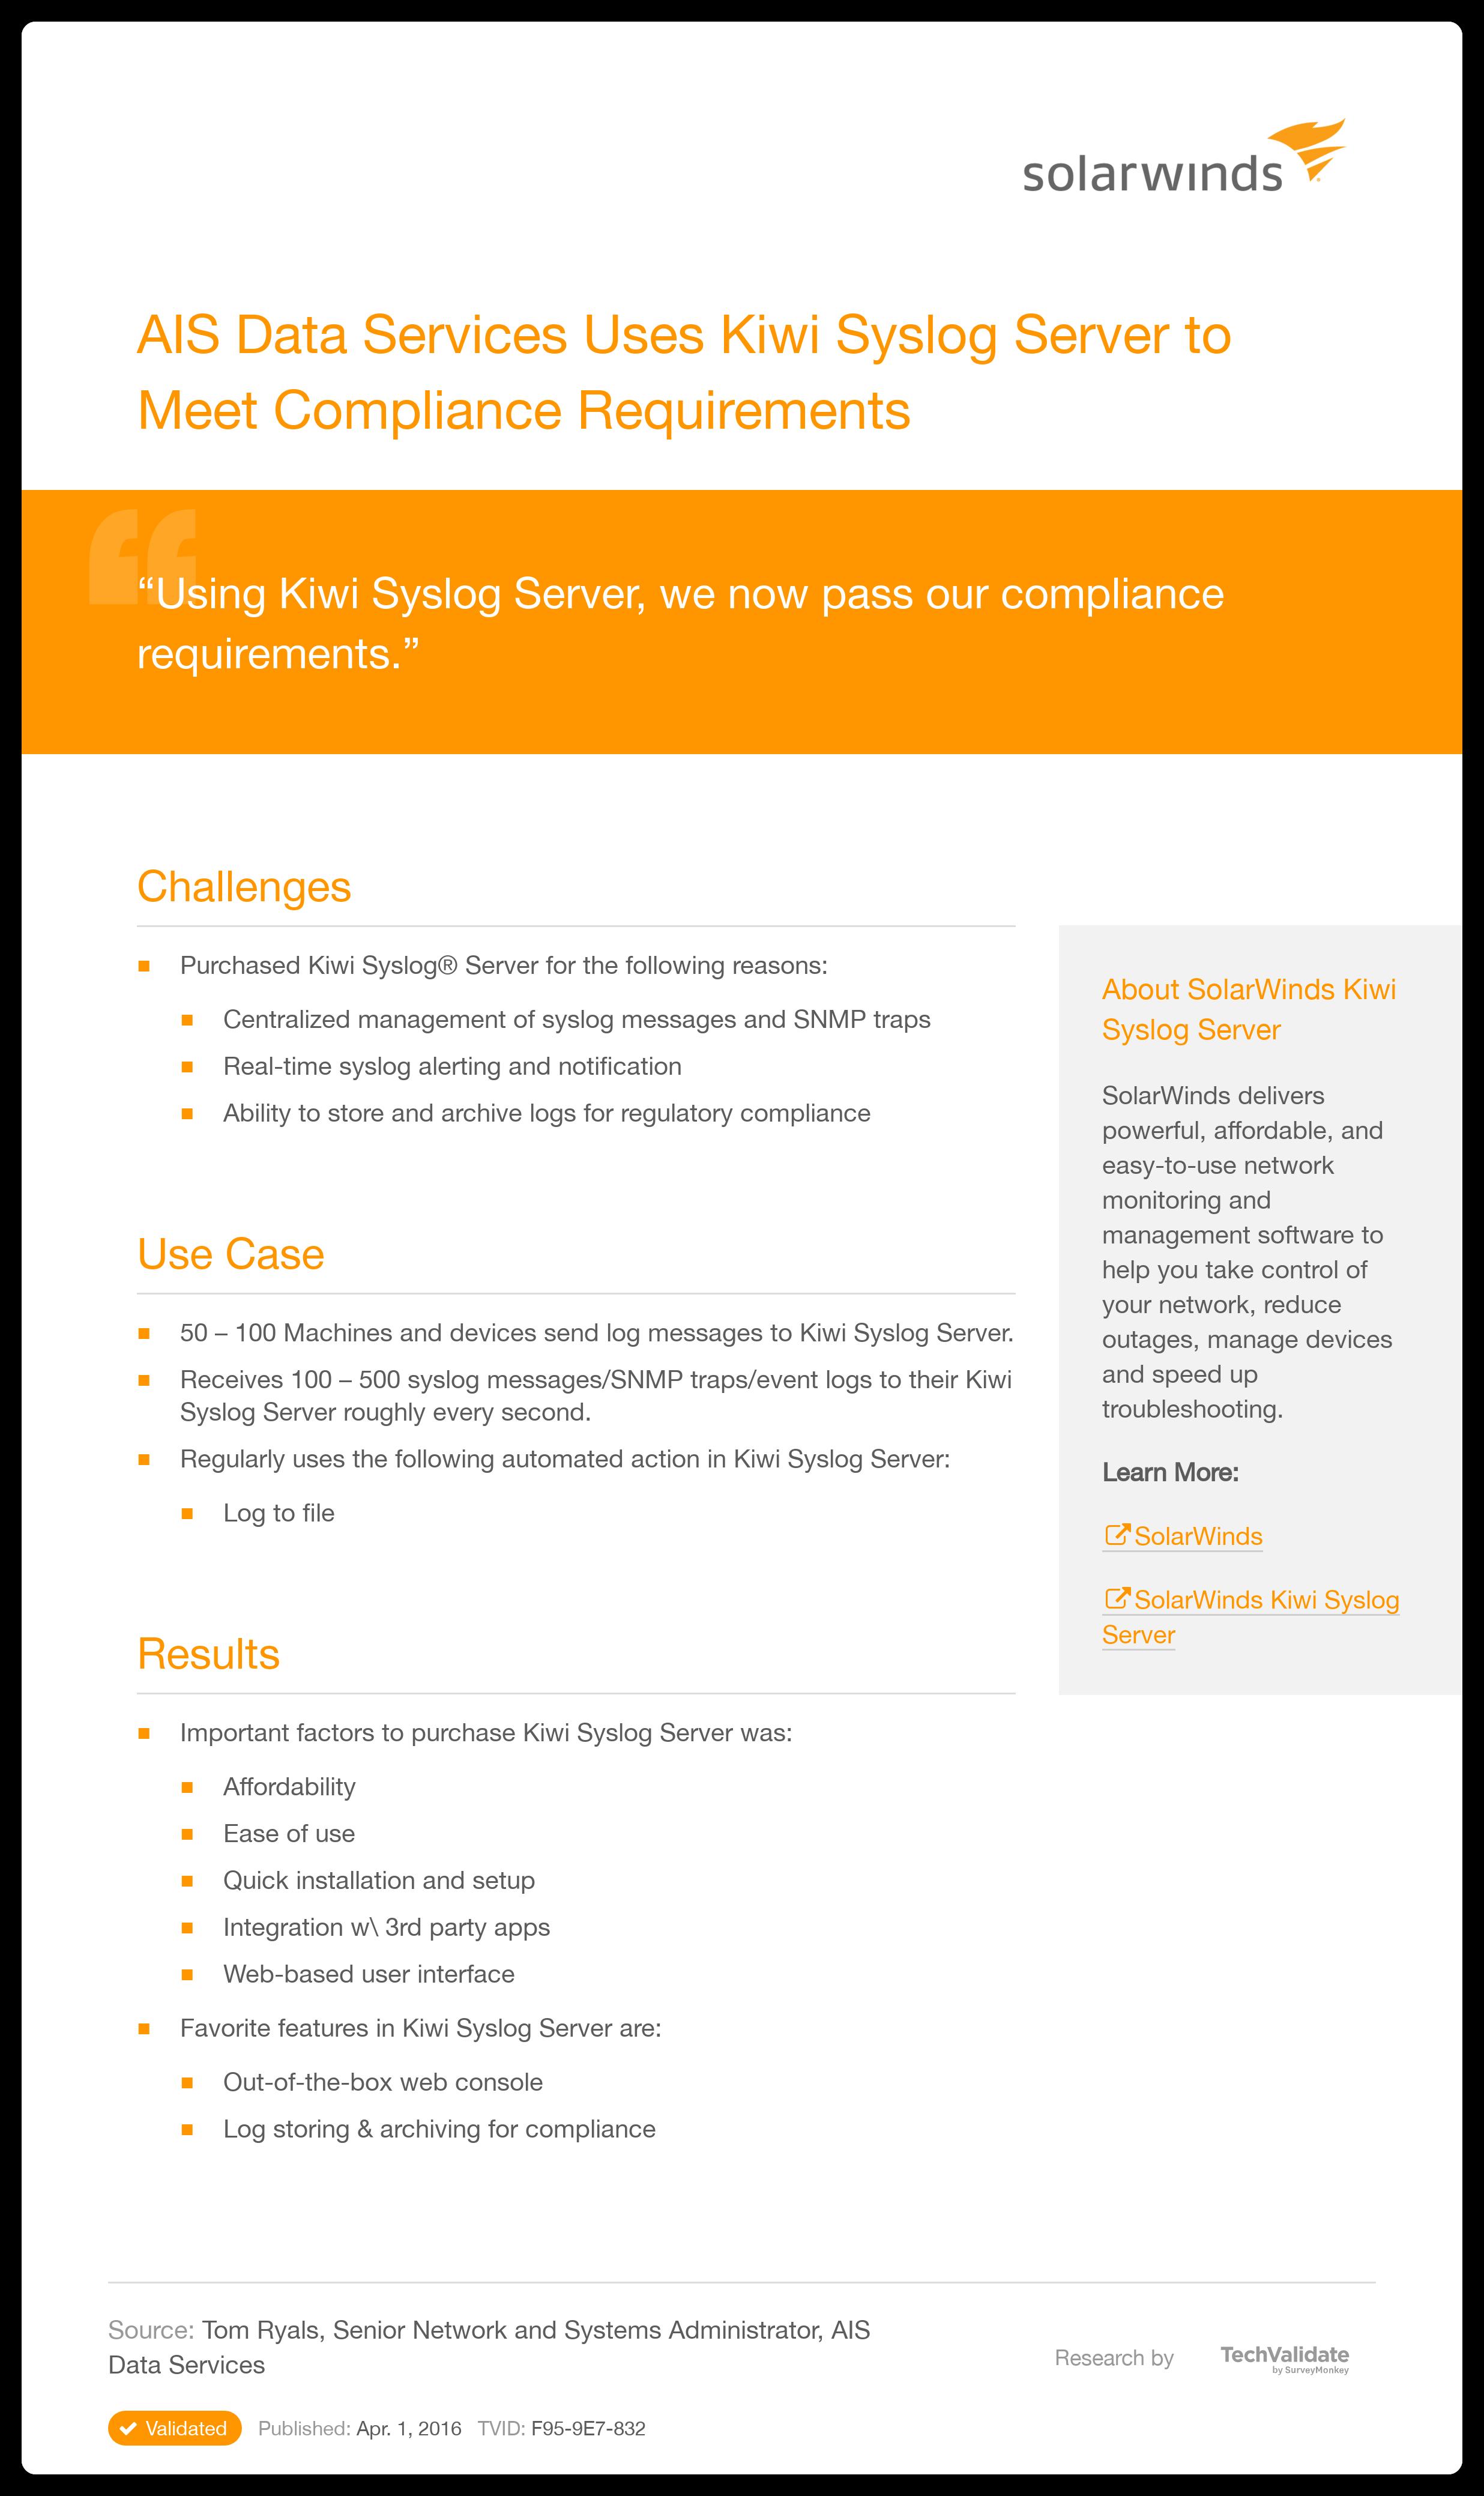 SolarWinds Network Management AIS Data Services Uses Kiwi